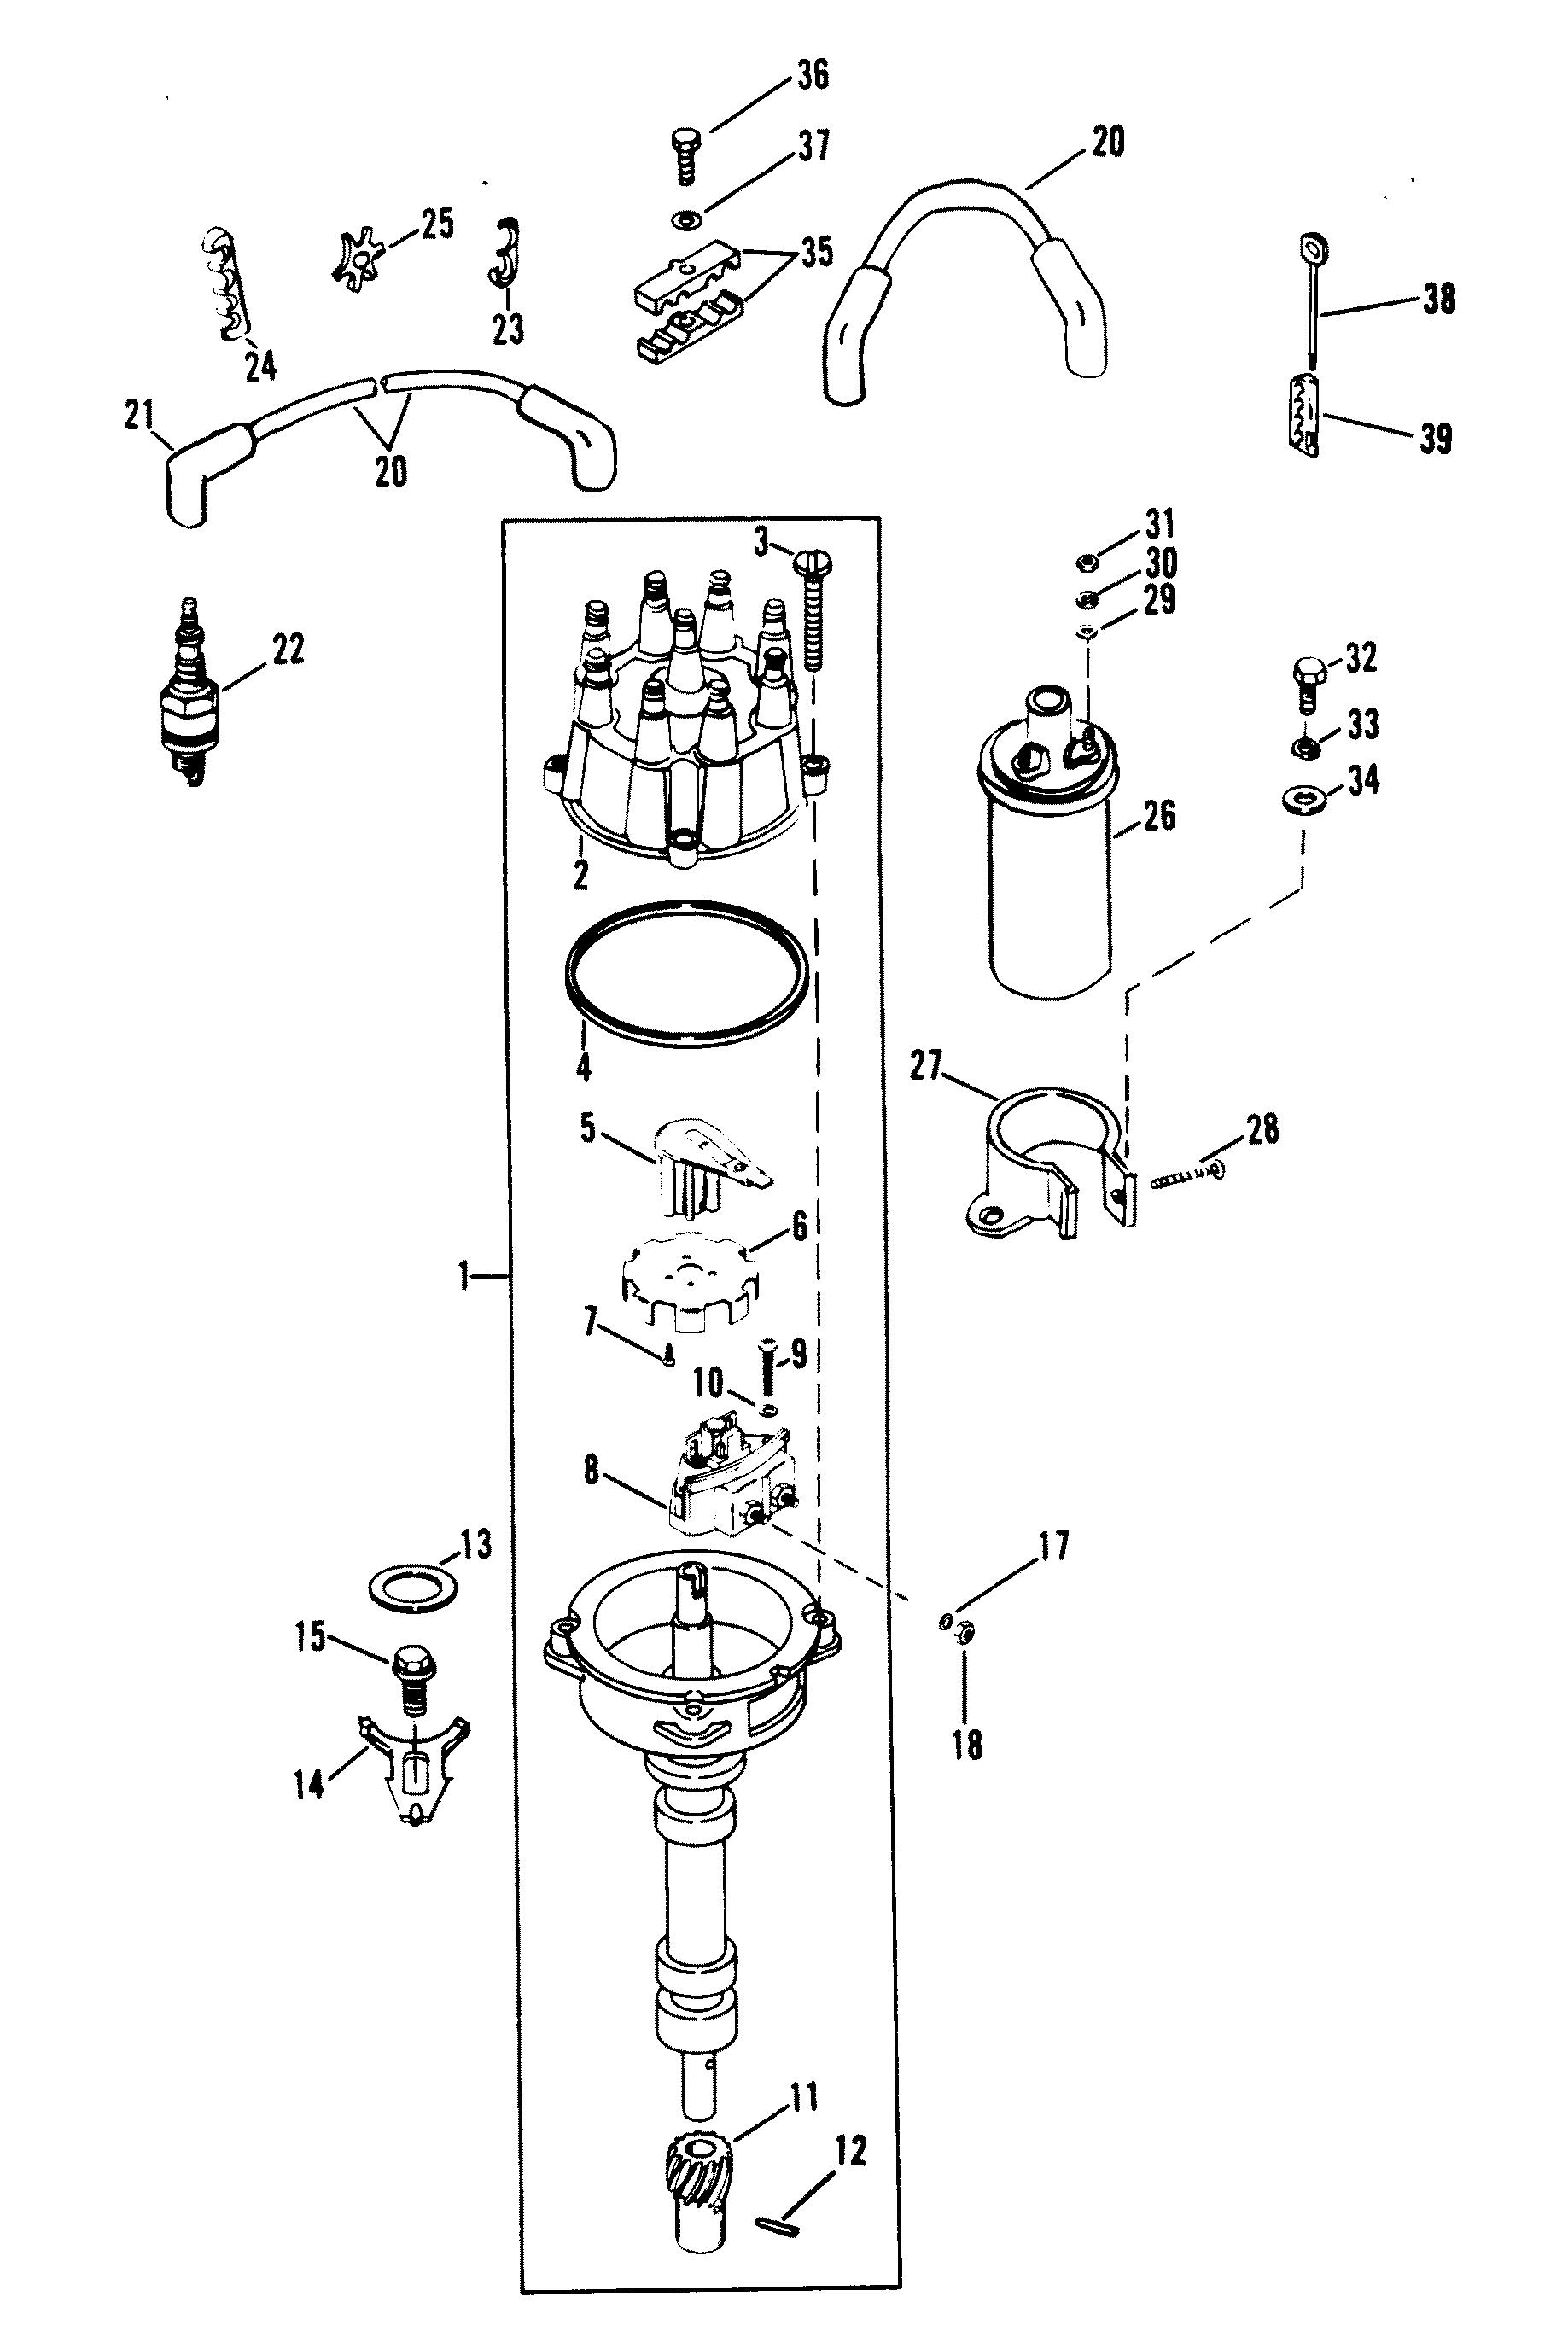 15  Mercruiser Engine Wiring Diagram on mercruiser 888 serial number, mercruiser 888 solenoid, mercruiser 888 controls, mercruiser 888 exhaust system, mercruiser 888 distributor,